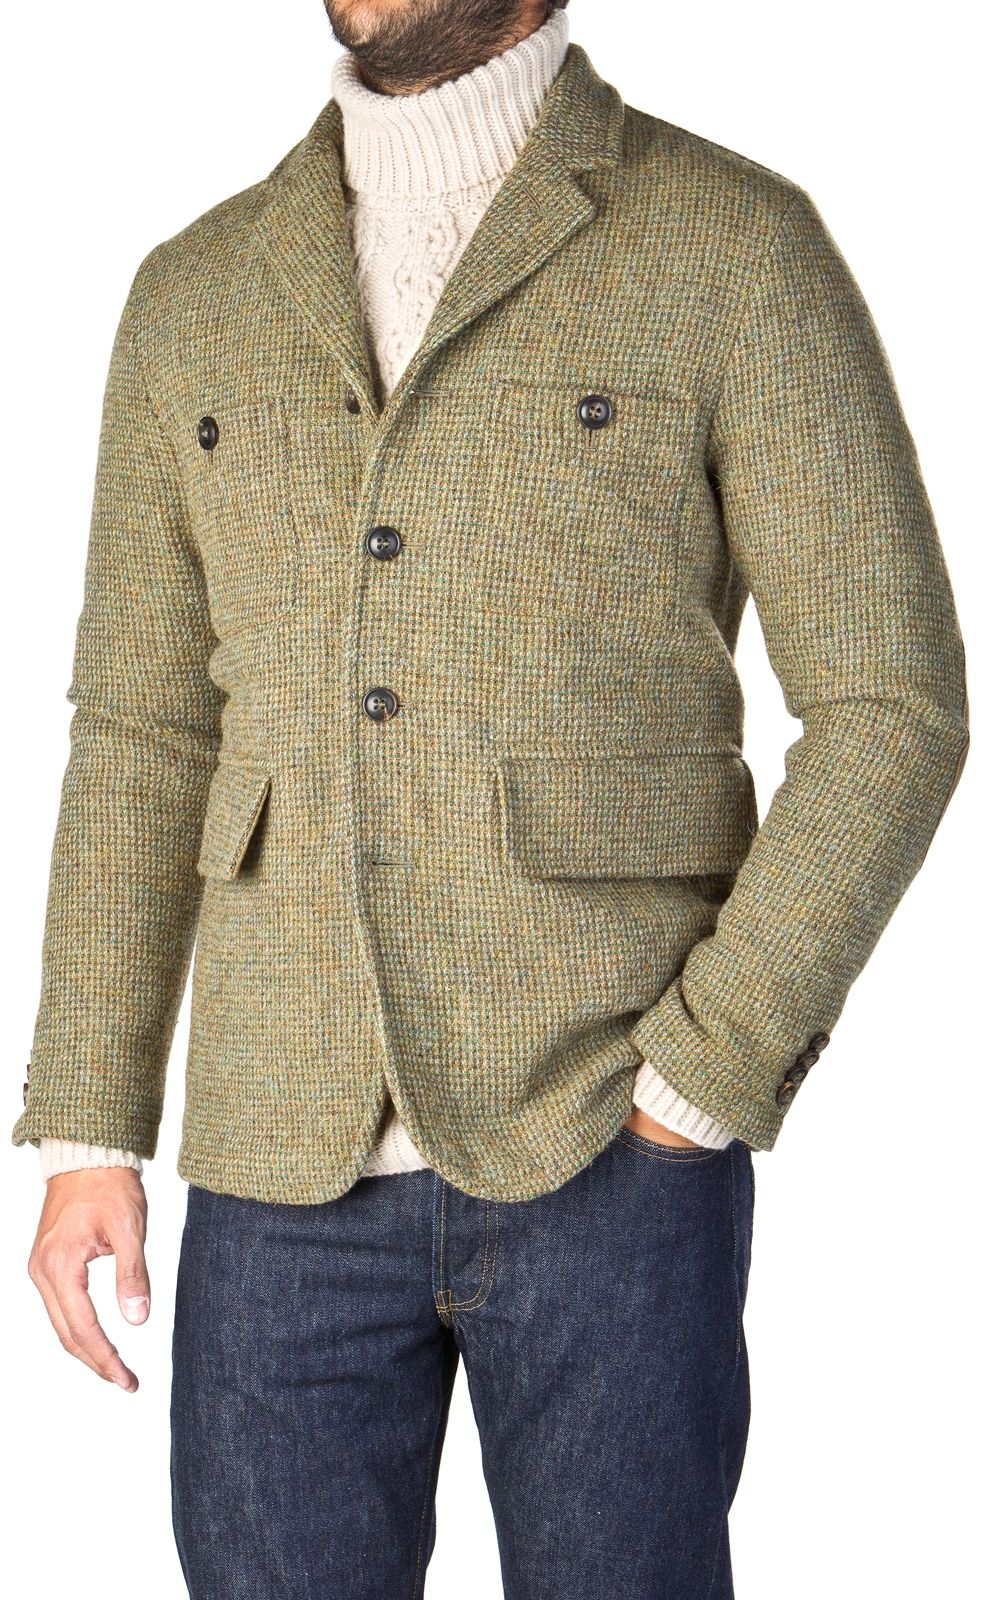 Nigel Cabourn Atkinson Jacket Harris Tweed Moss  06de4f41b0f